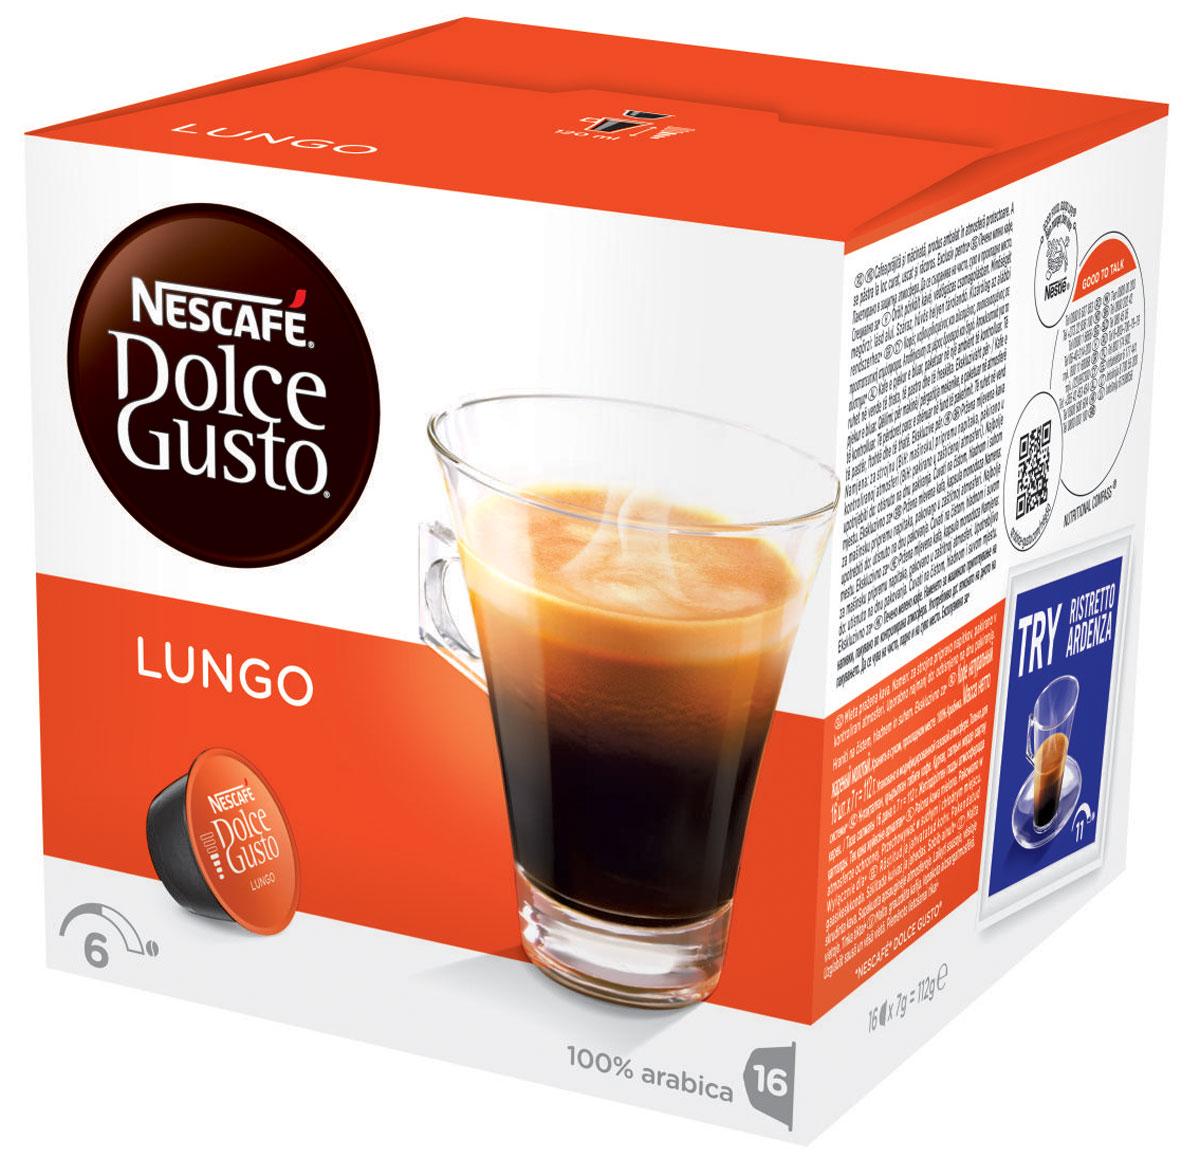 Nescafe Dolce Gusto Lungo кофе в капсулах, 16 шт футболка немо унисекс